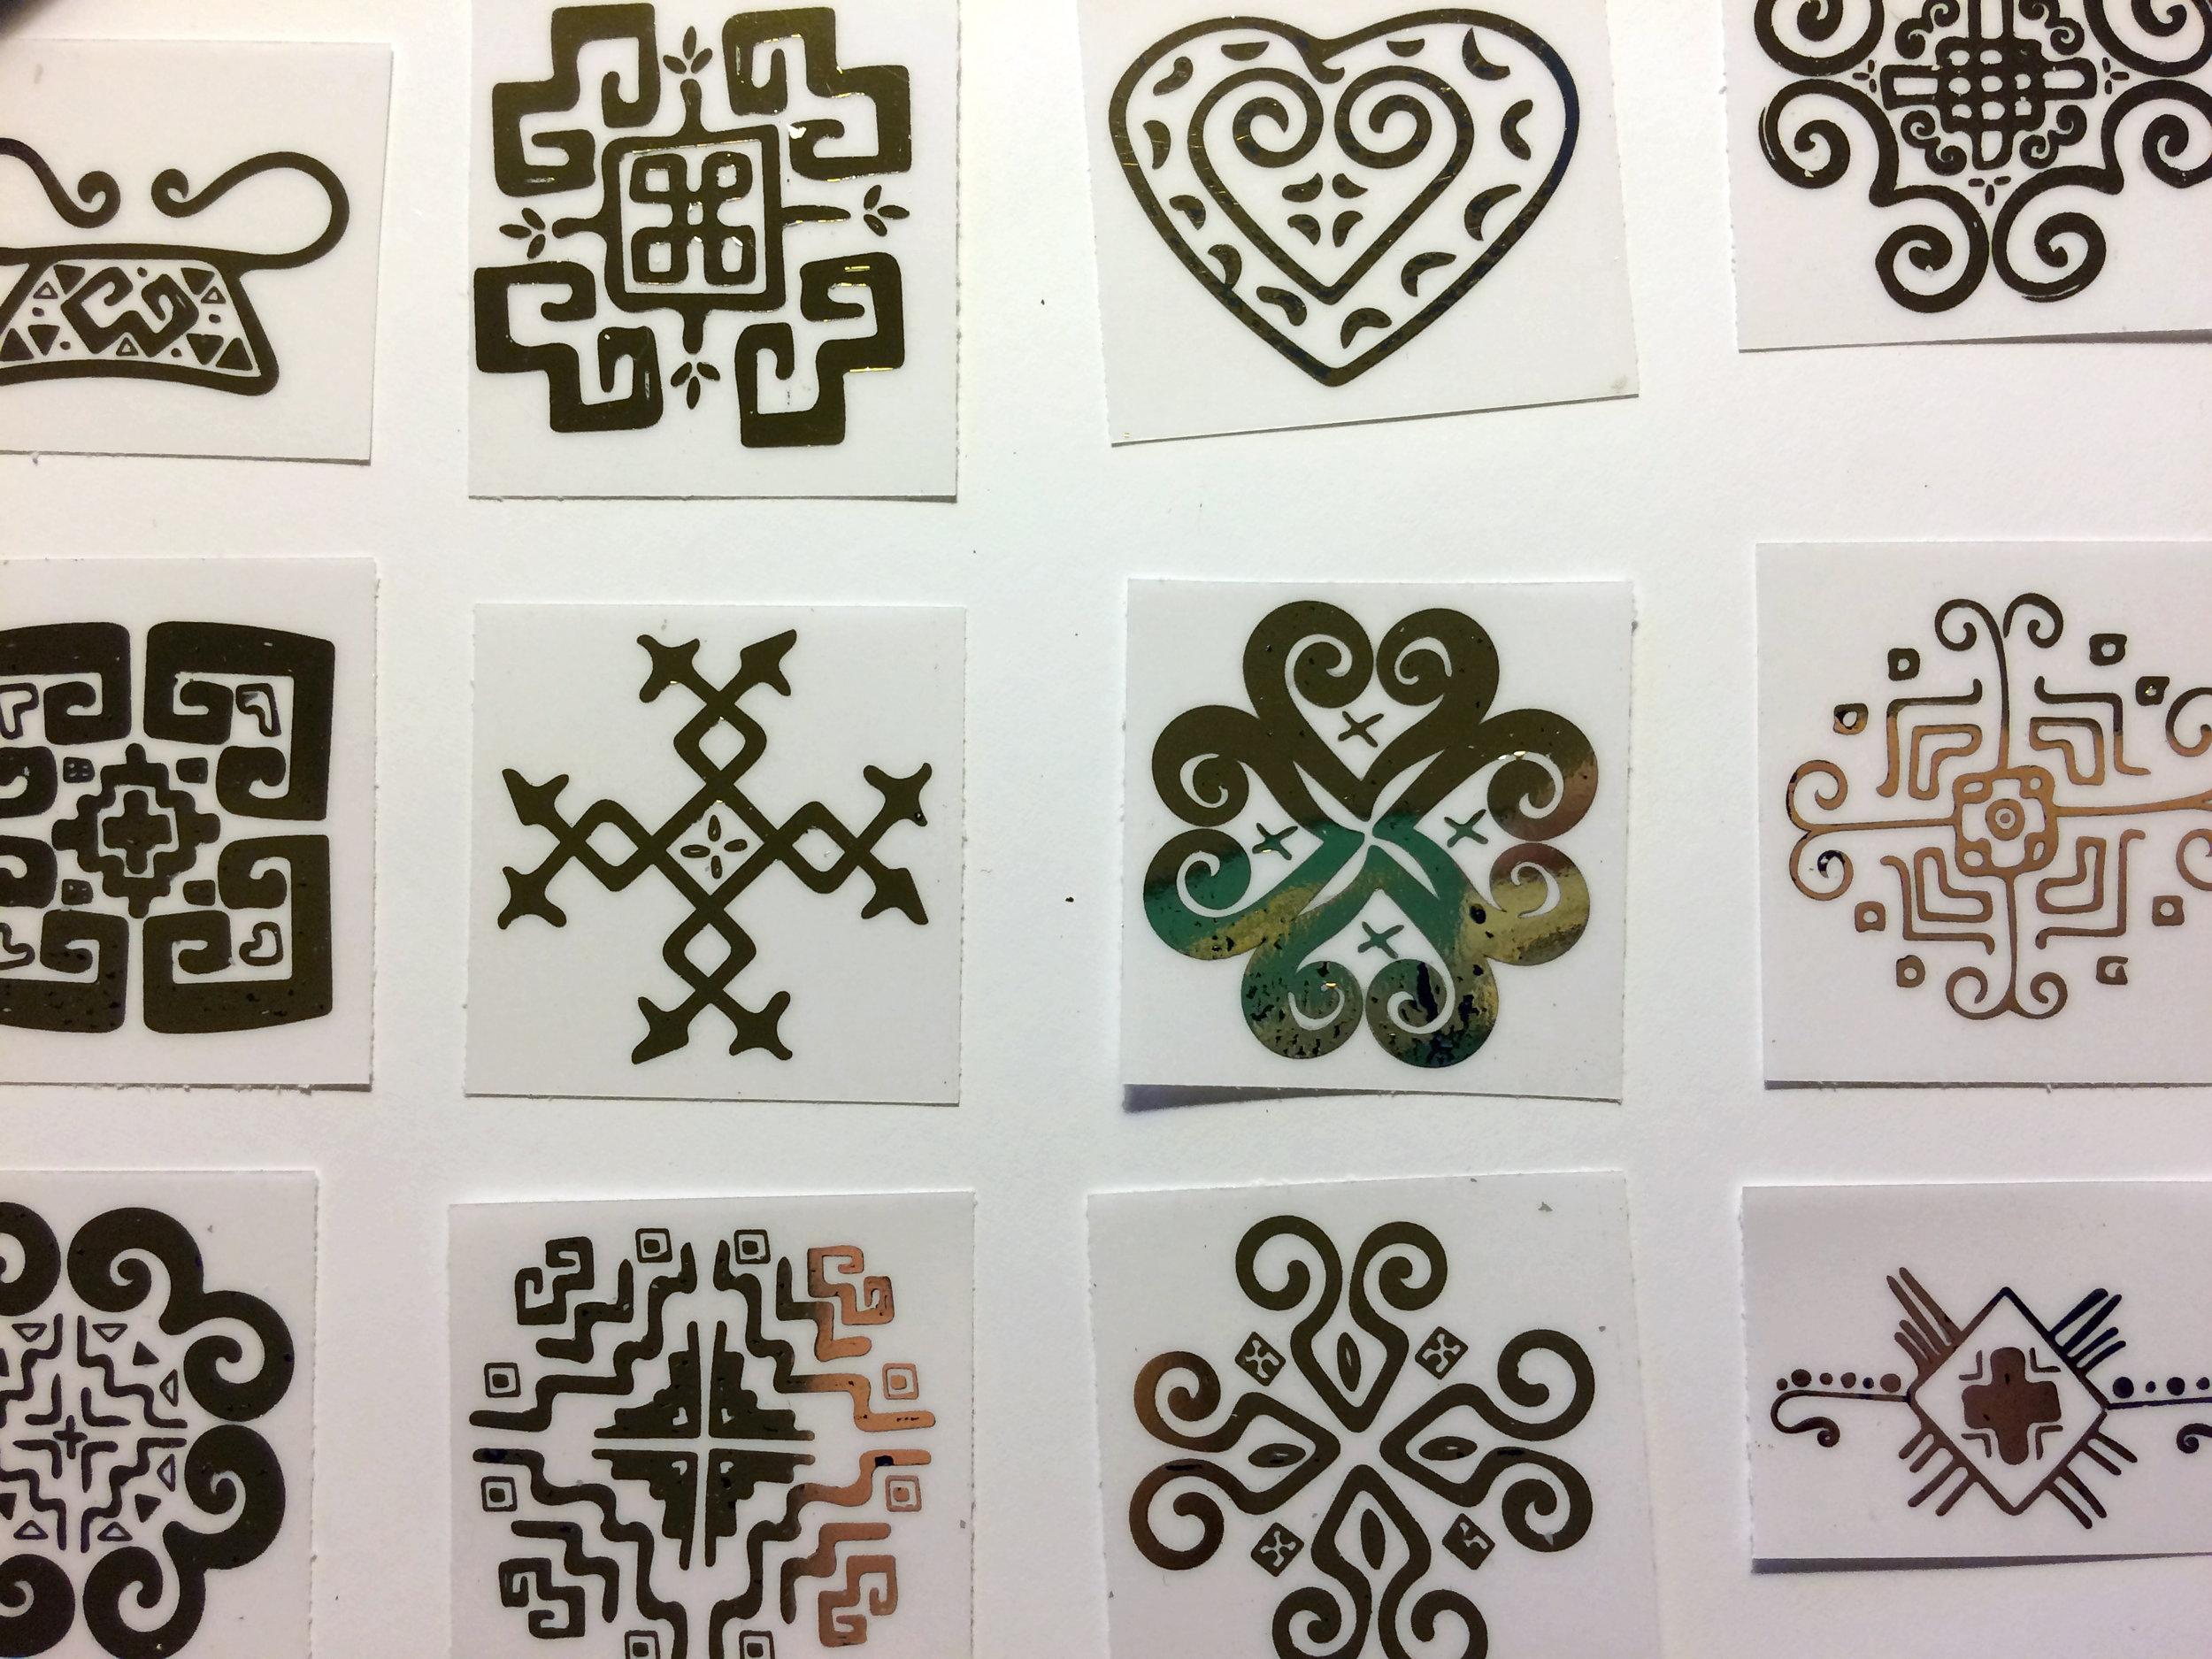 stickers003.jpg